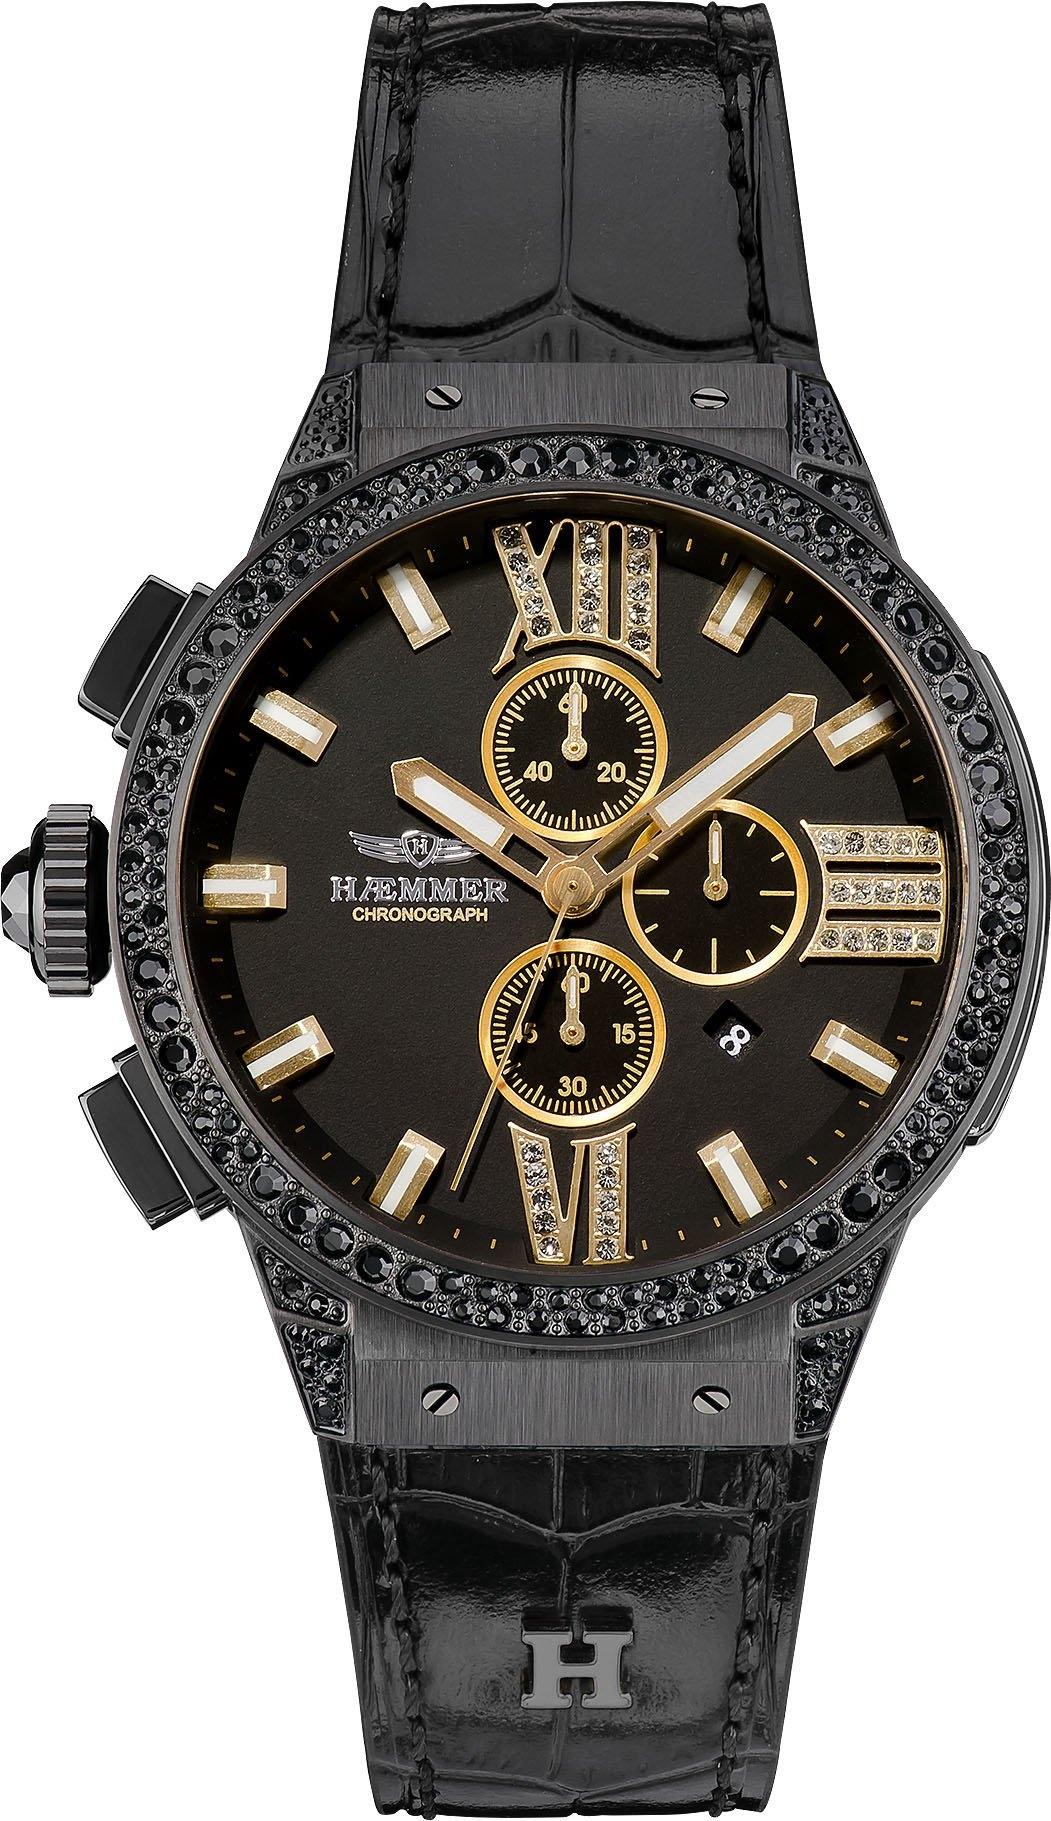 HAEMMER GERMANY chronograaf DARK NIGHT, E-002-Sg - gratis ruilen op otto.nl